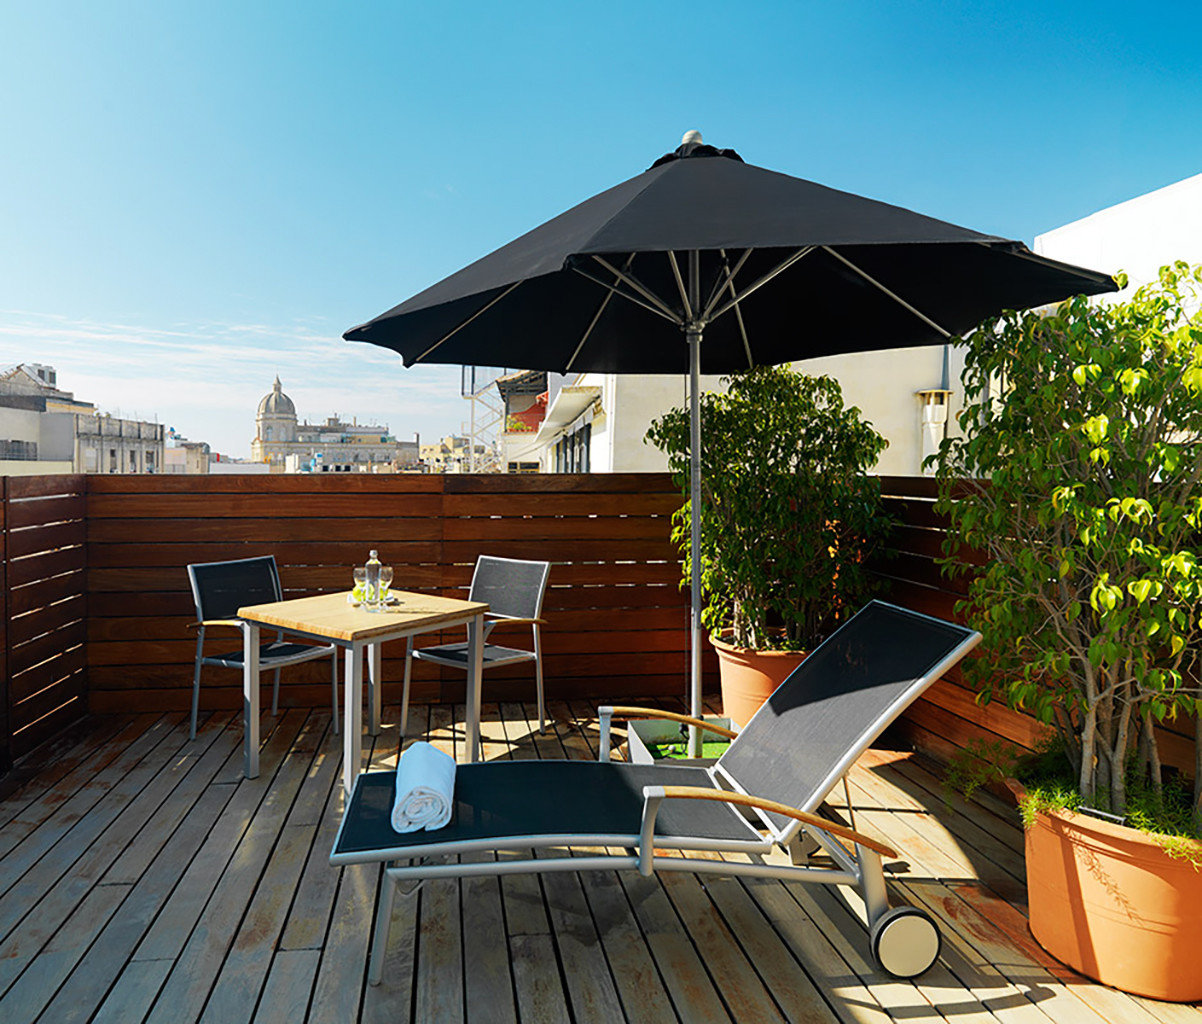 sky umbrella chair outdoor structure canopy cottage backyard gazebo Villa Deck set